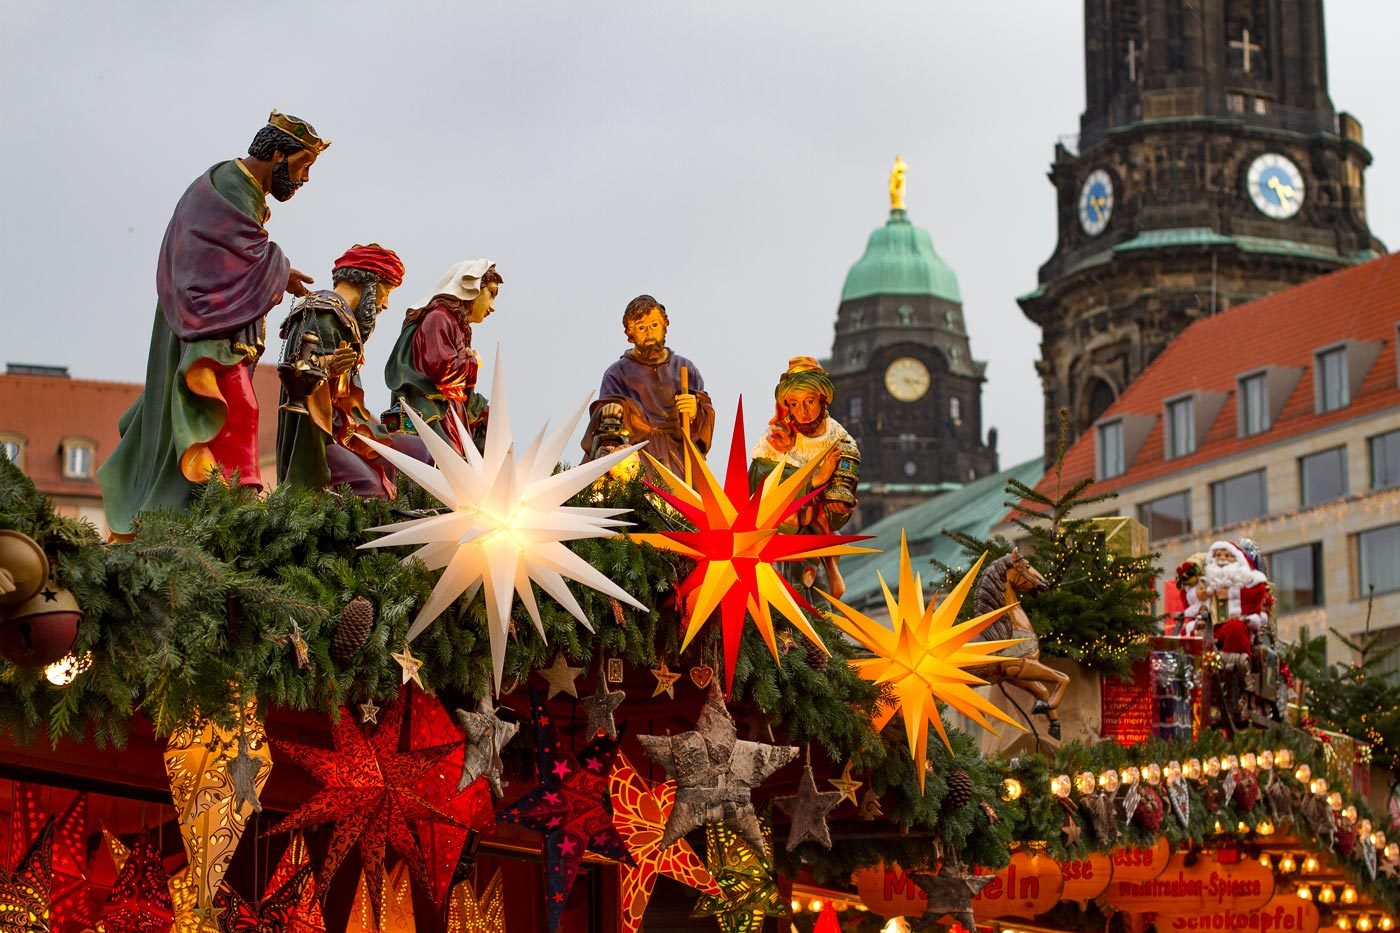 Адвентная ярмарка в Дрездене, Германия, 2013 год